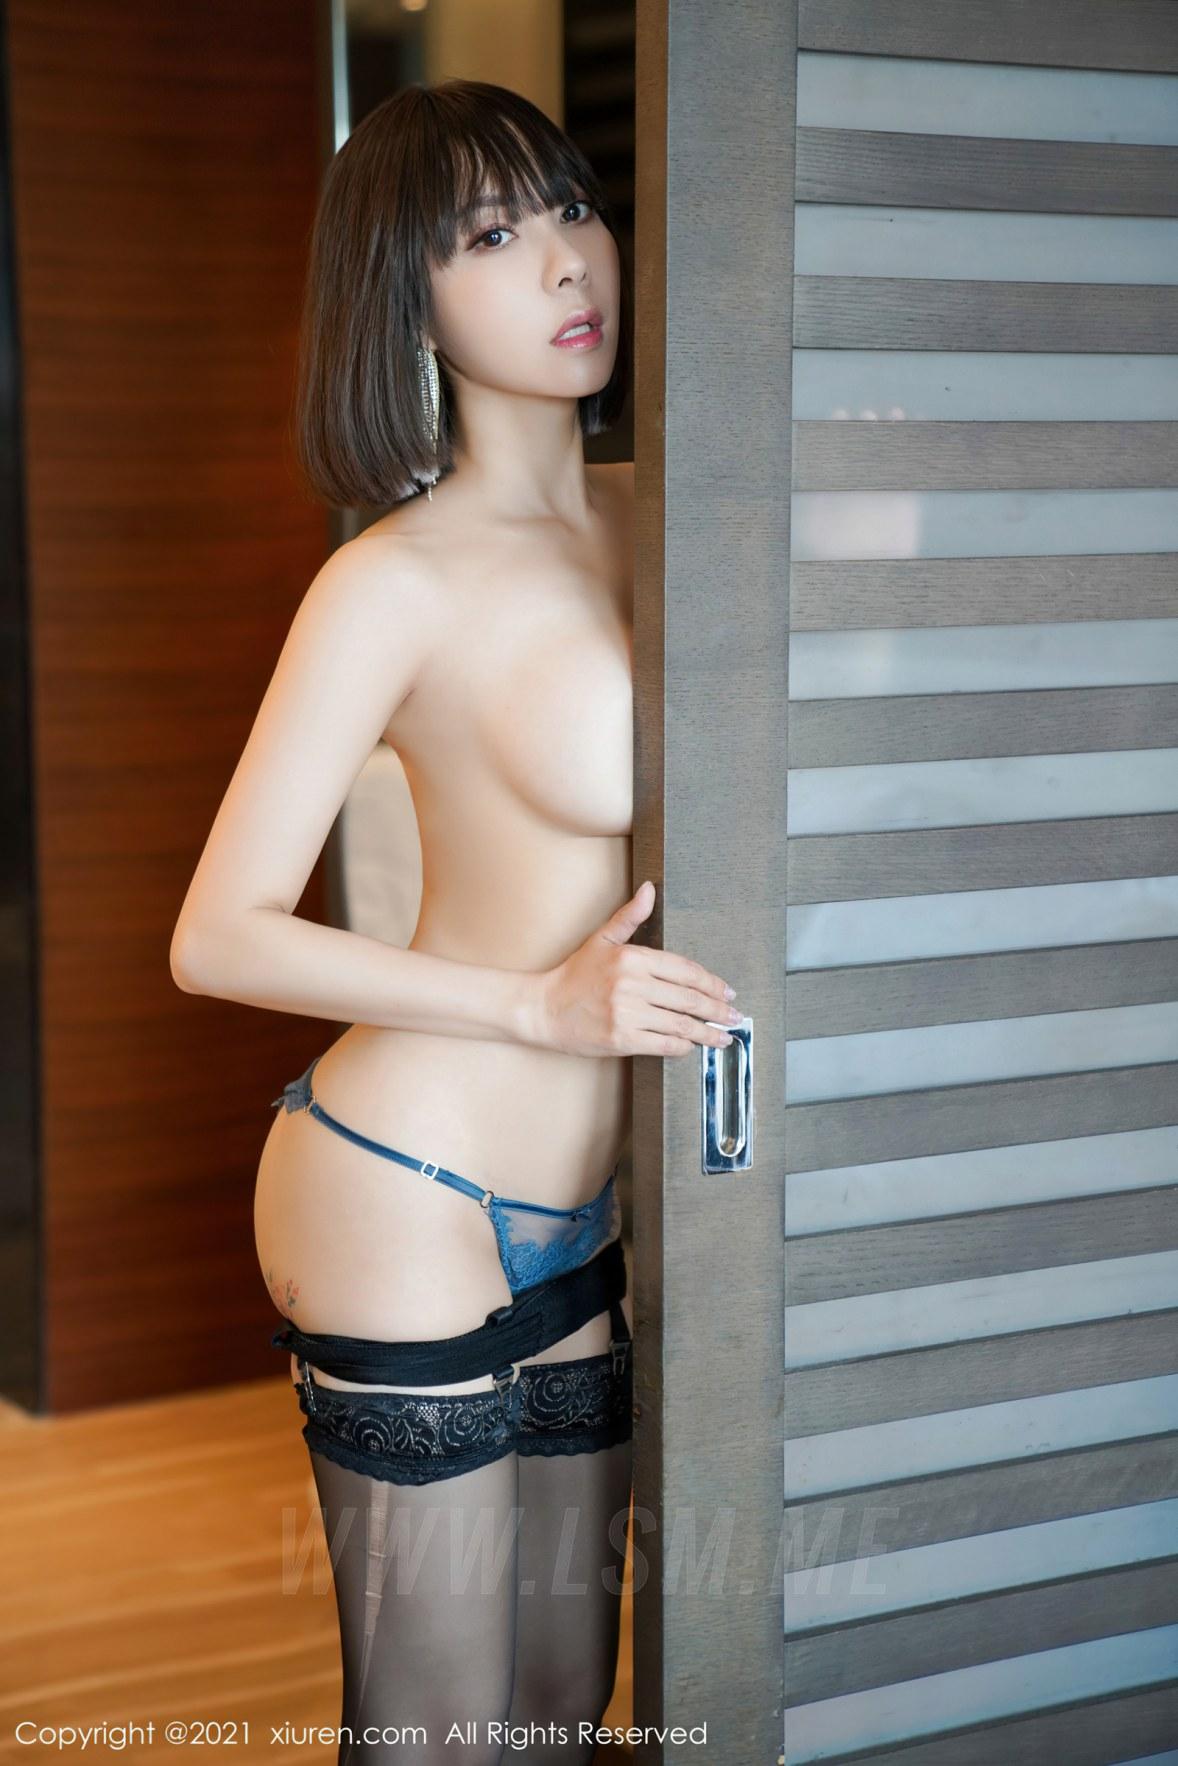 3652 049 474 3603 5400 - XiuRen 秀人 No.3652 深V吊裙 果儿Victoria 北京旅拍3 - 秀人网 -【免费在线写真】【丽人丝语】